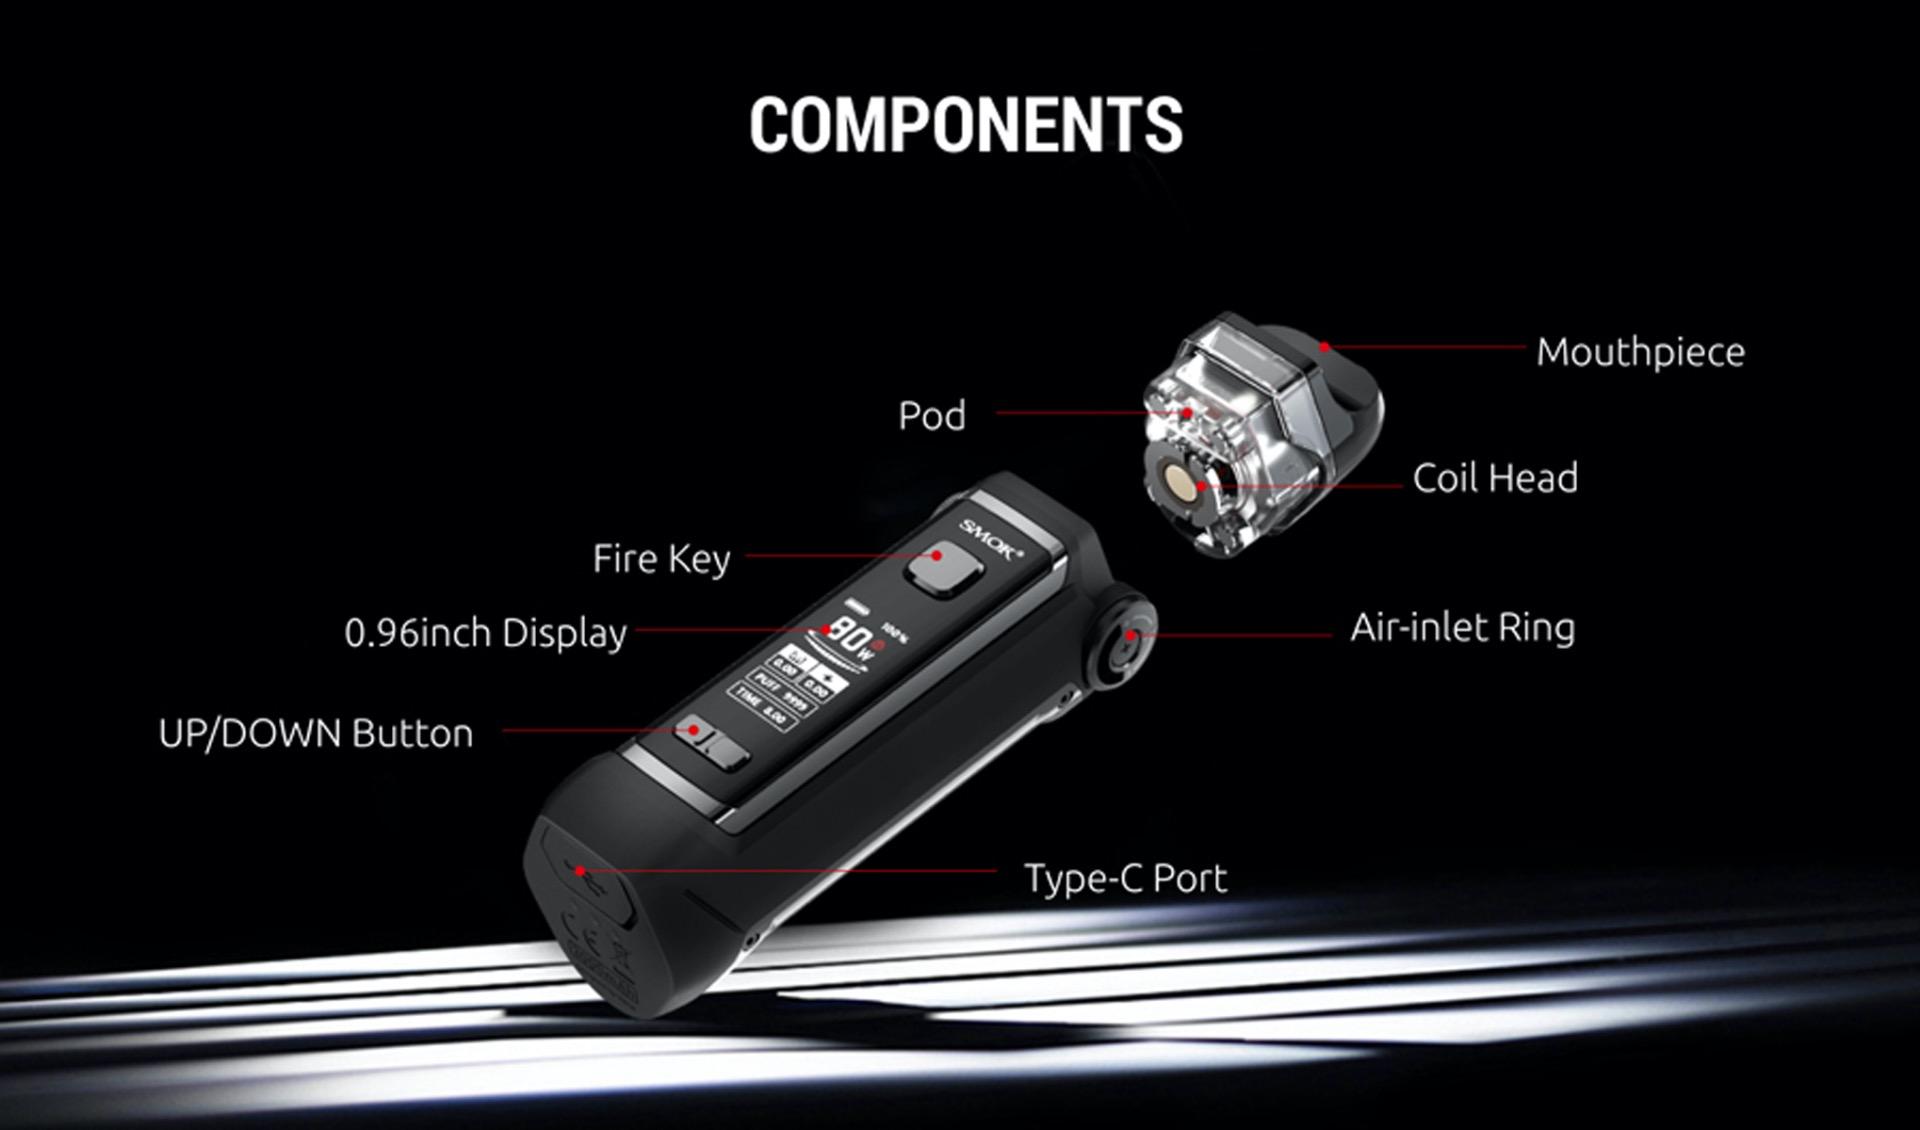 Smok IPX 80 components